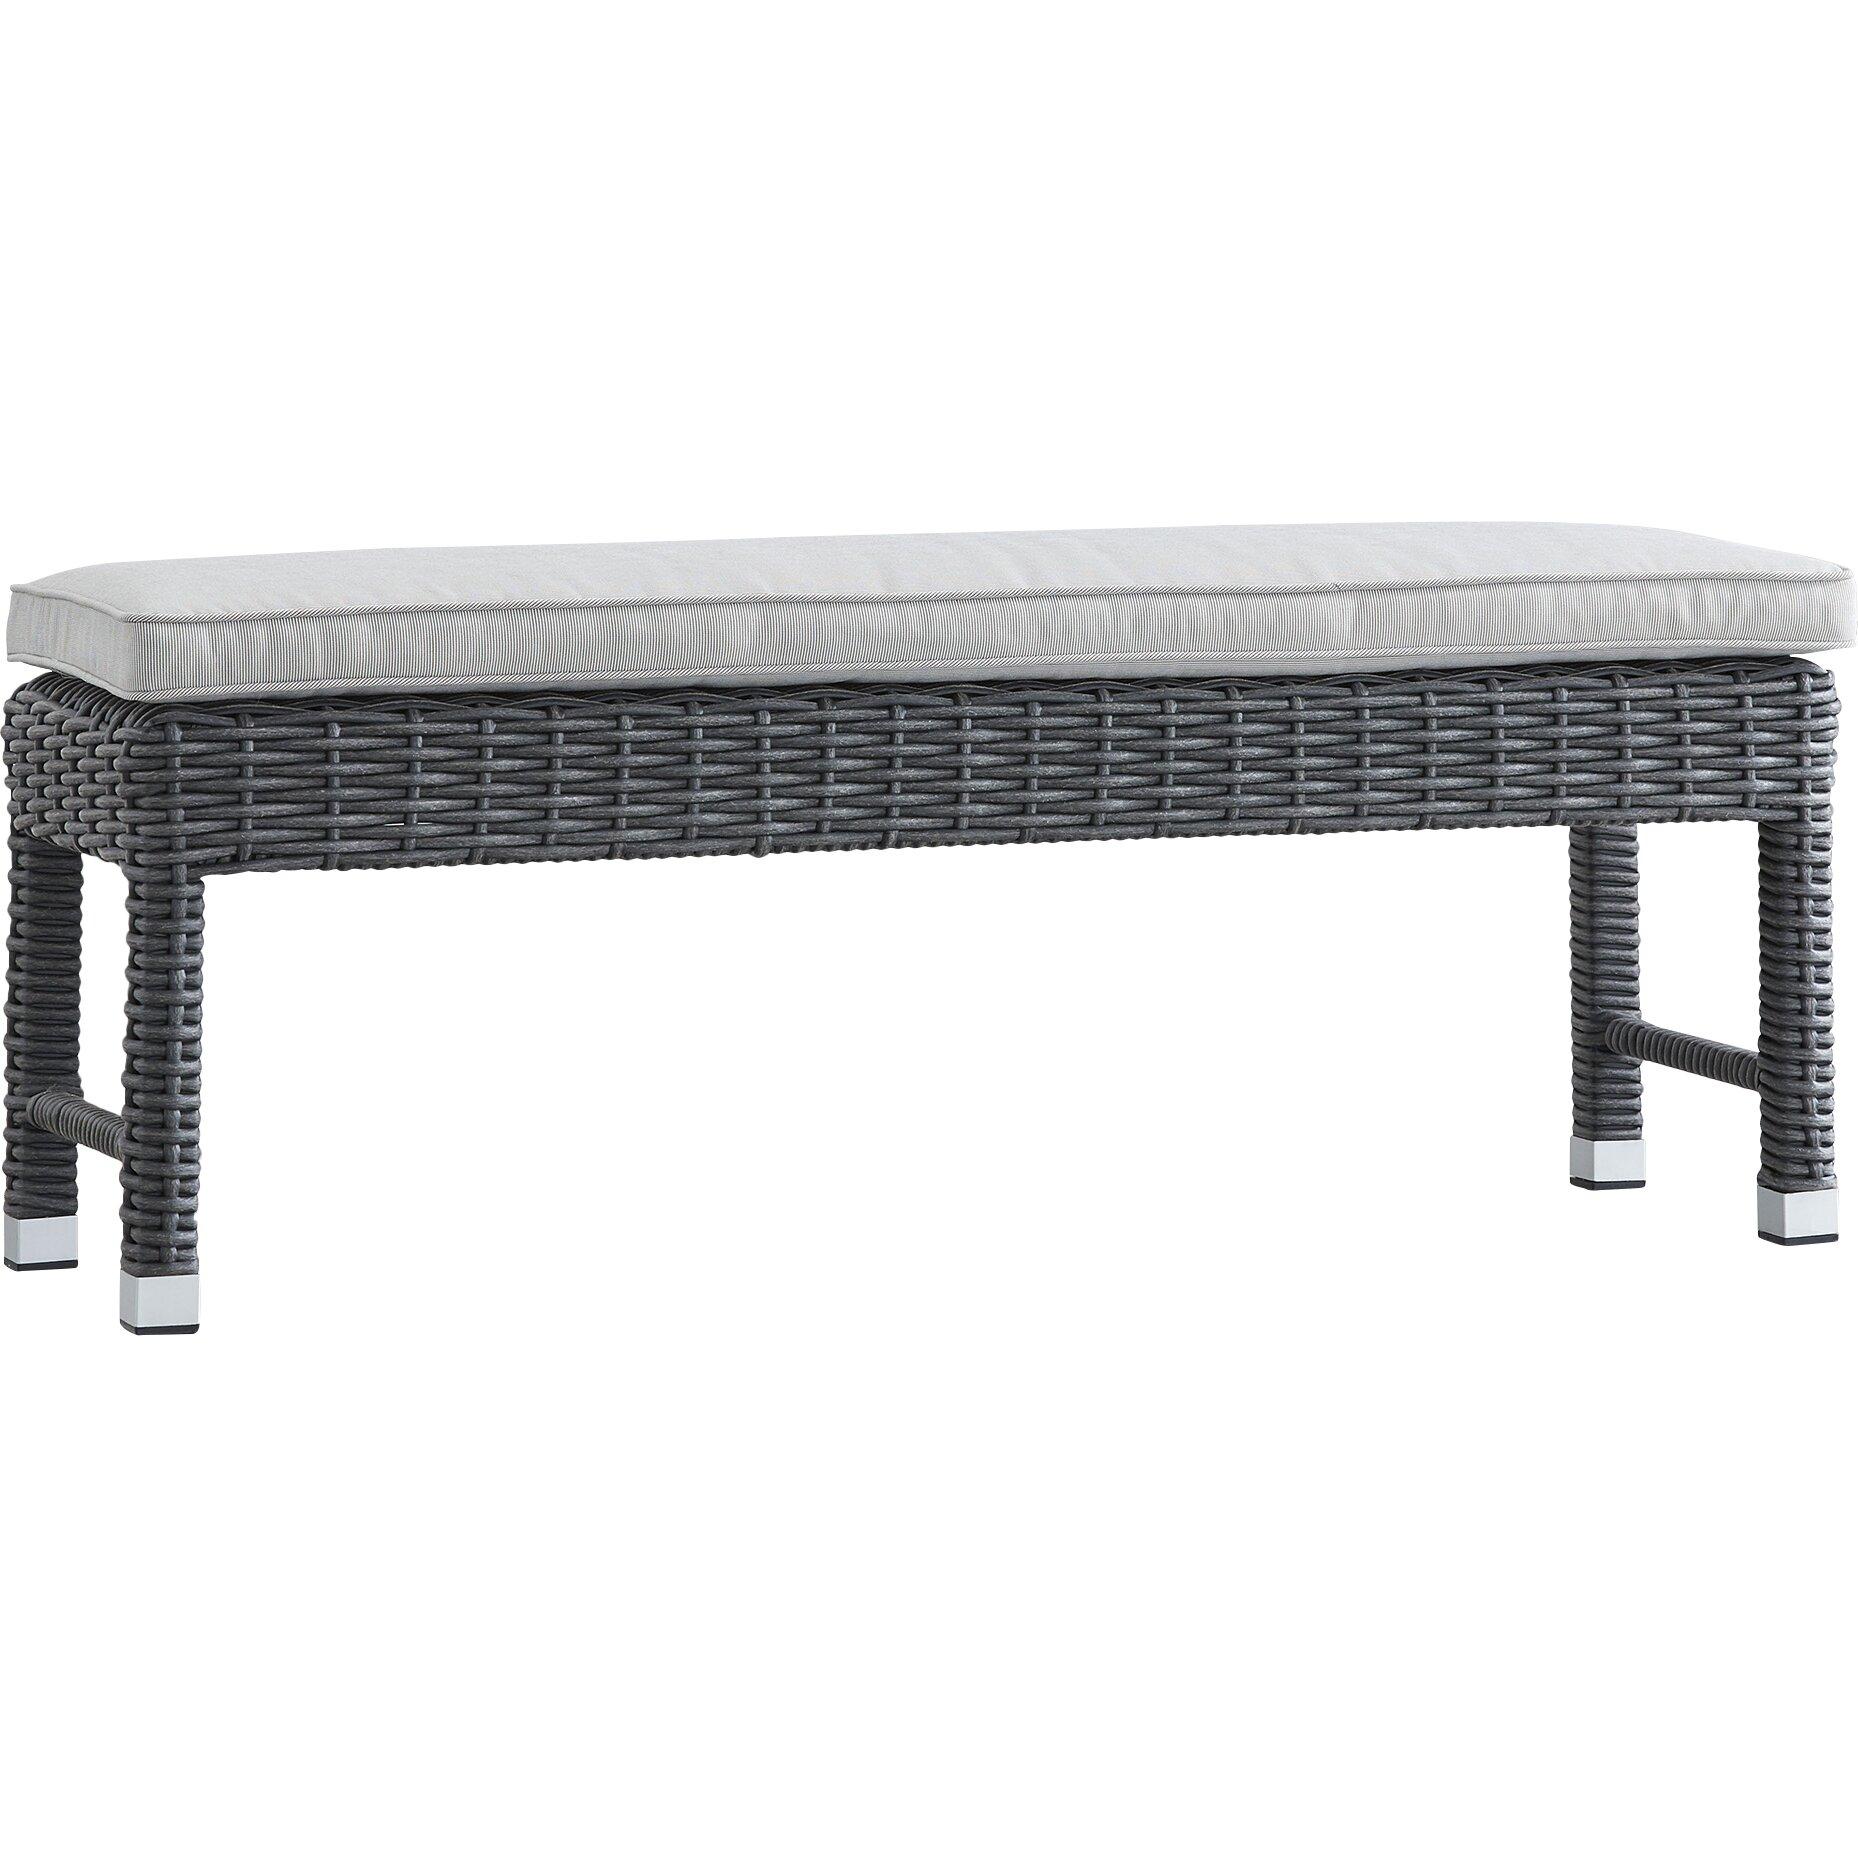 Shannon Aluminum/Wicker Garden Bench : Joss u0026 Main